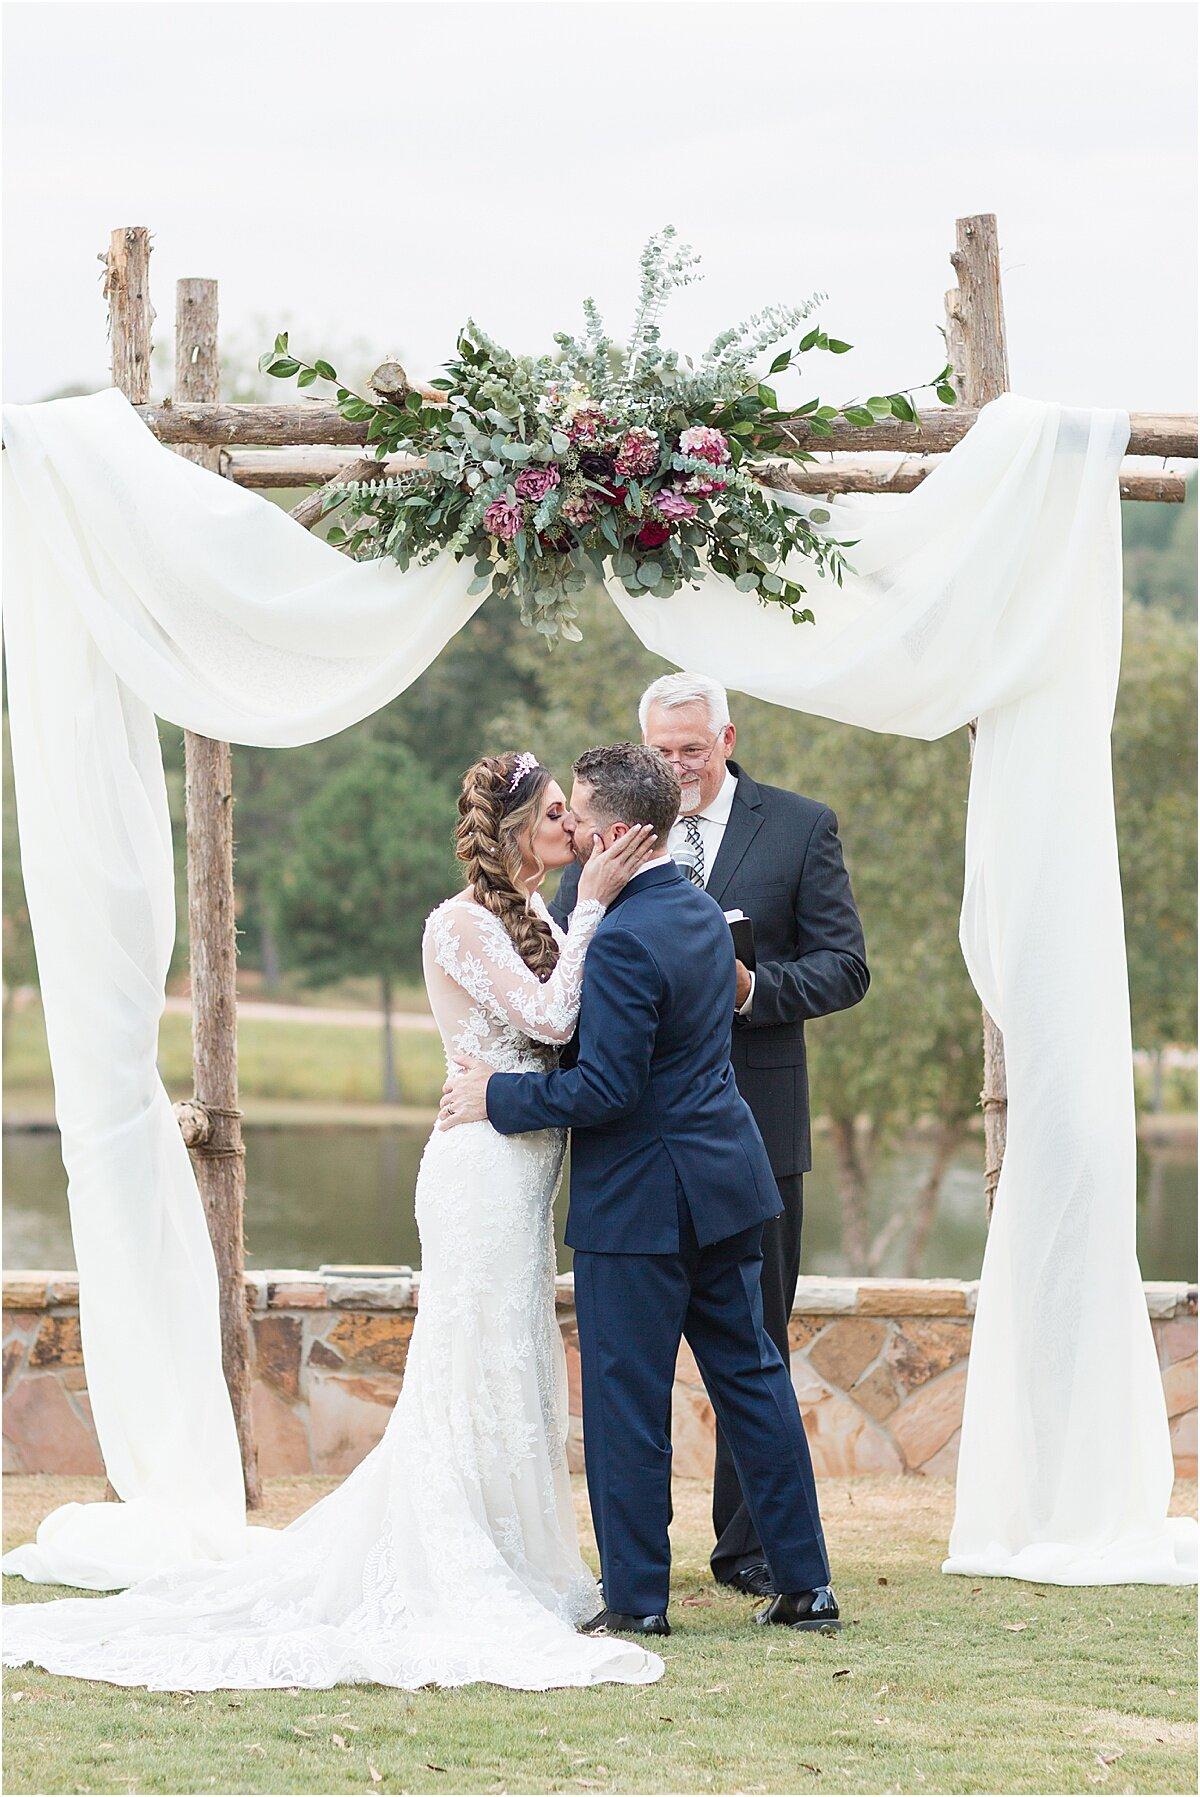 Jersey_Ga_Wedding_Venues_Holly_L_Robbins_Photography_0078.jpg